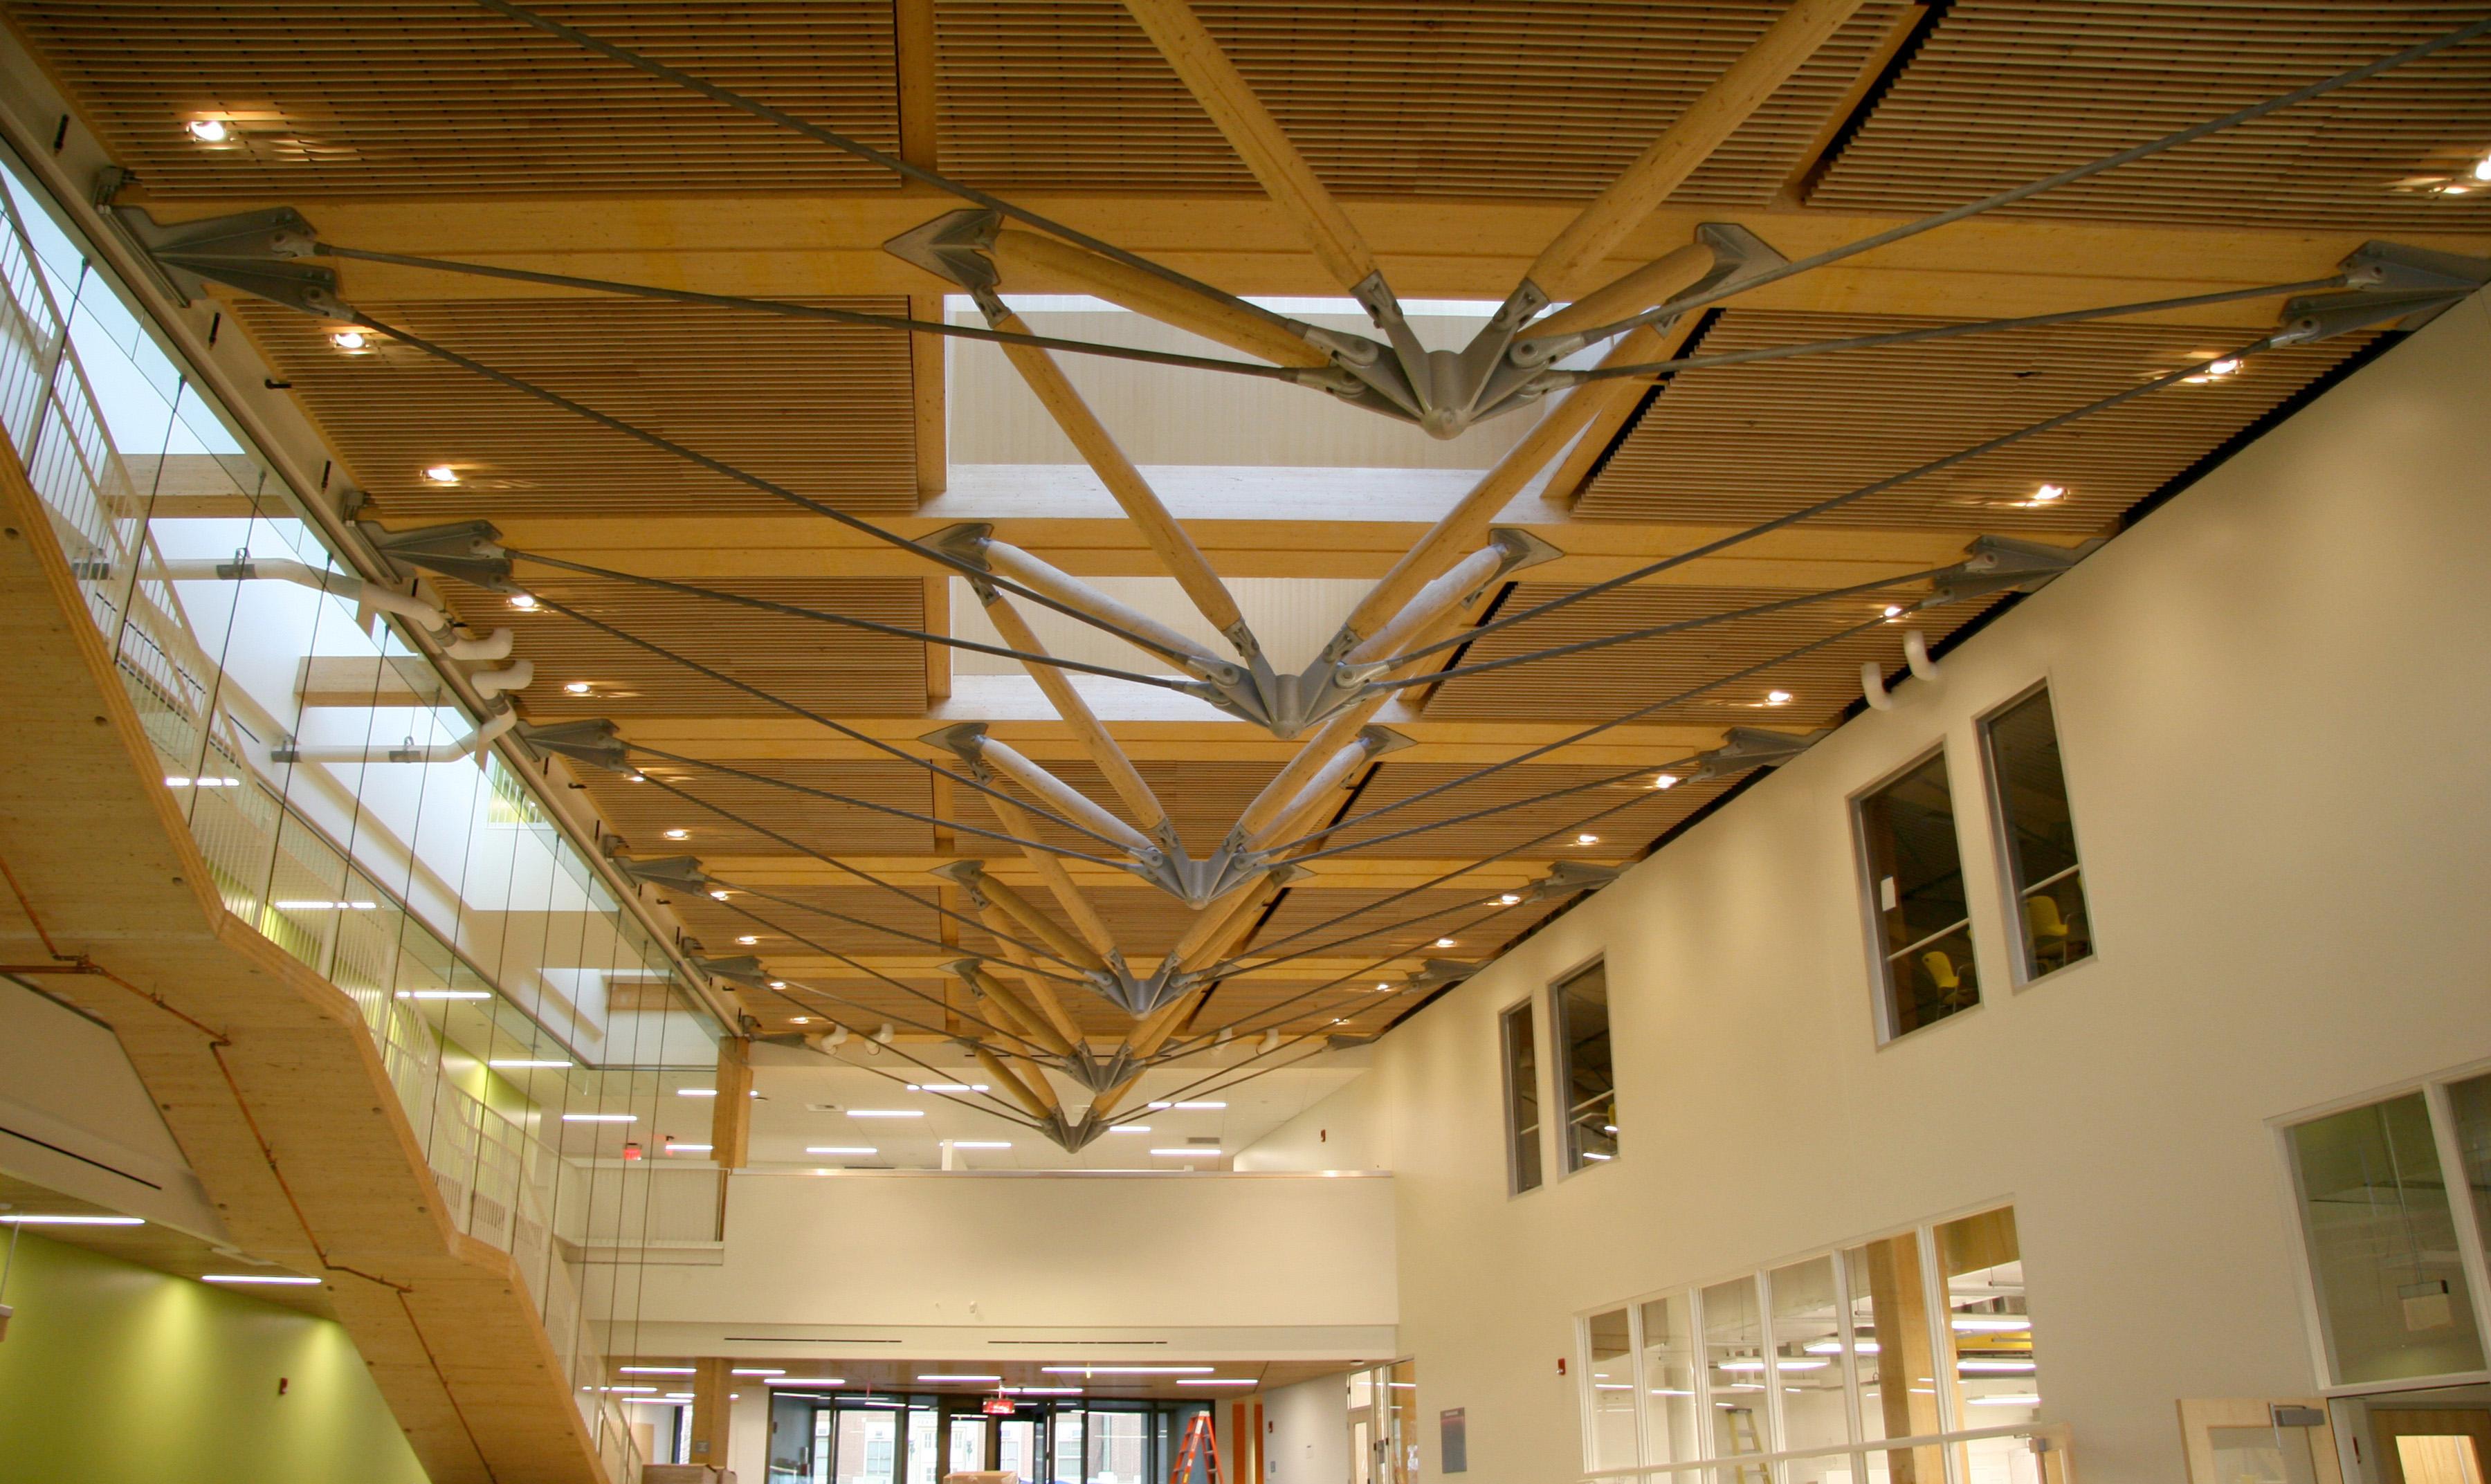 Castconnex Umass Amherst John W Olver Design Building